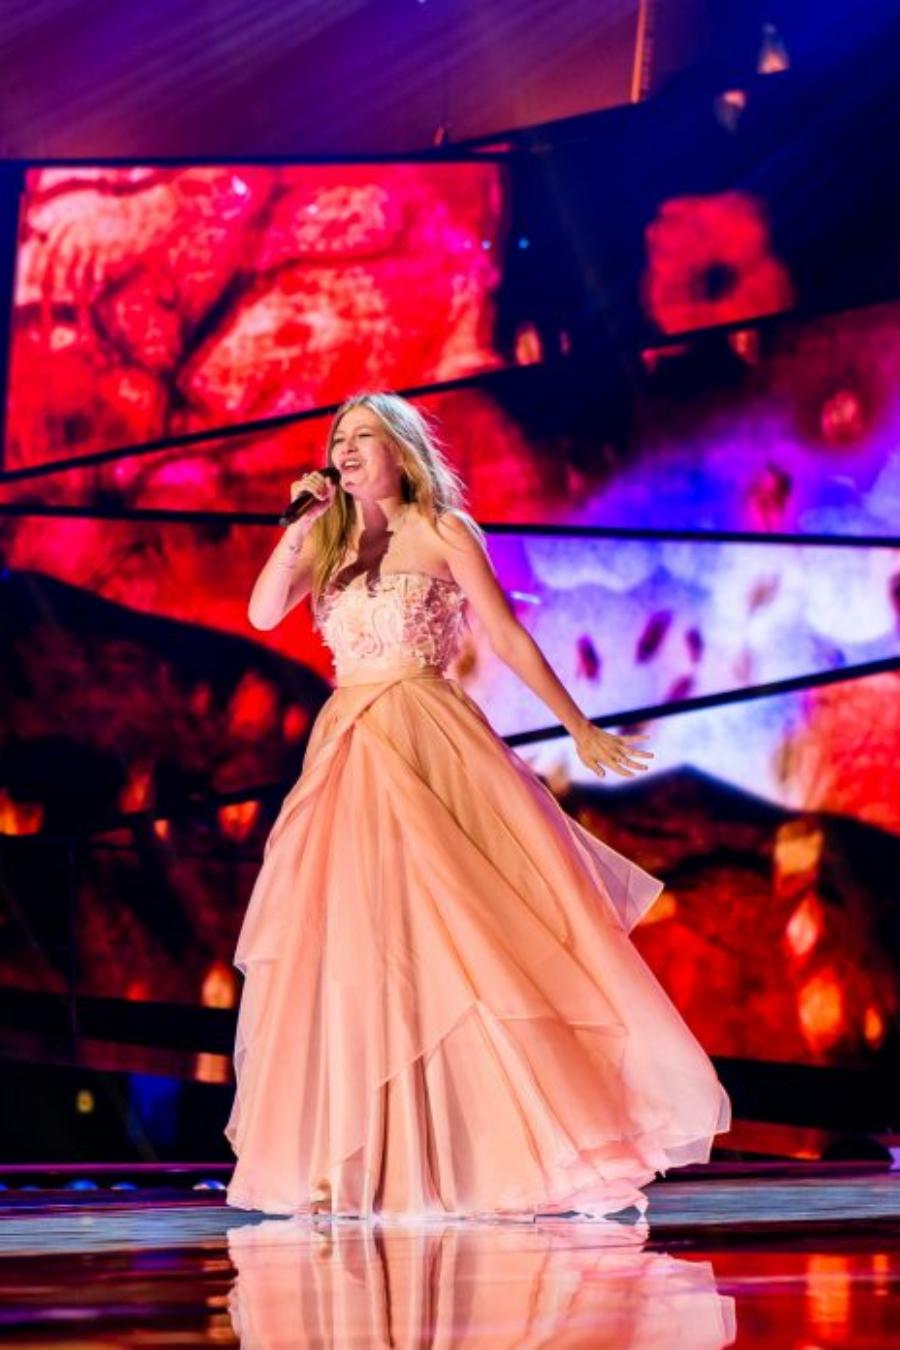 Eurovision Song Contest 2016: Austria